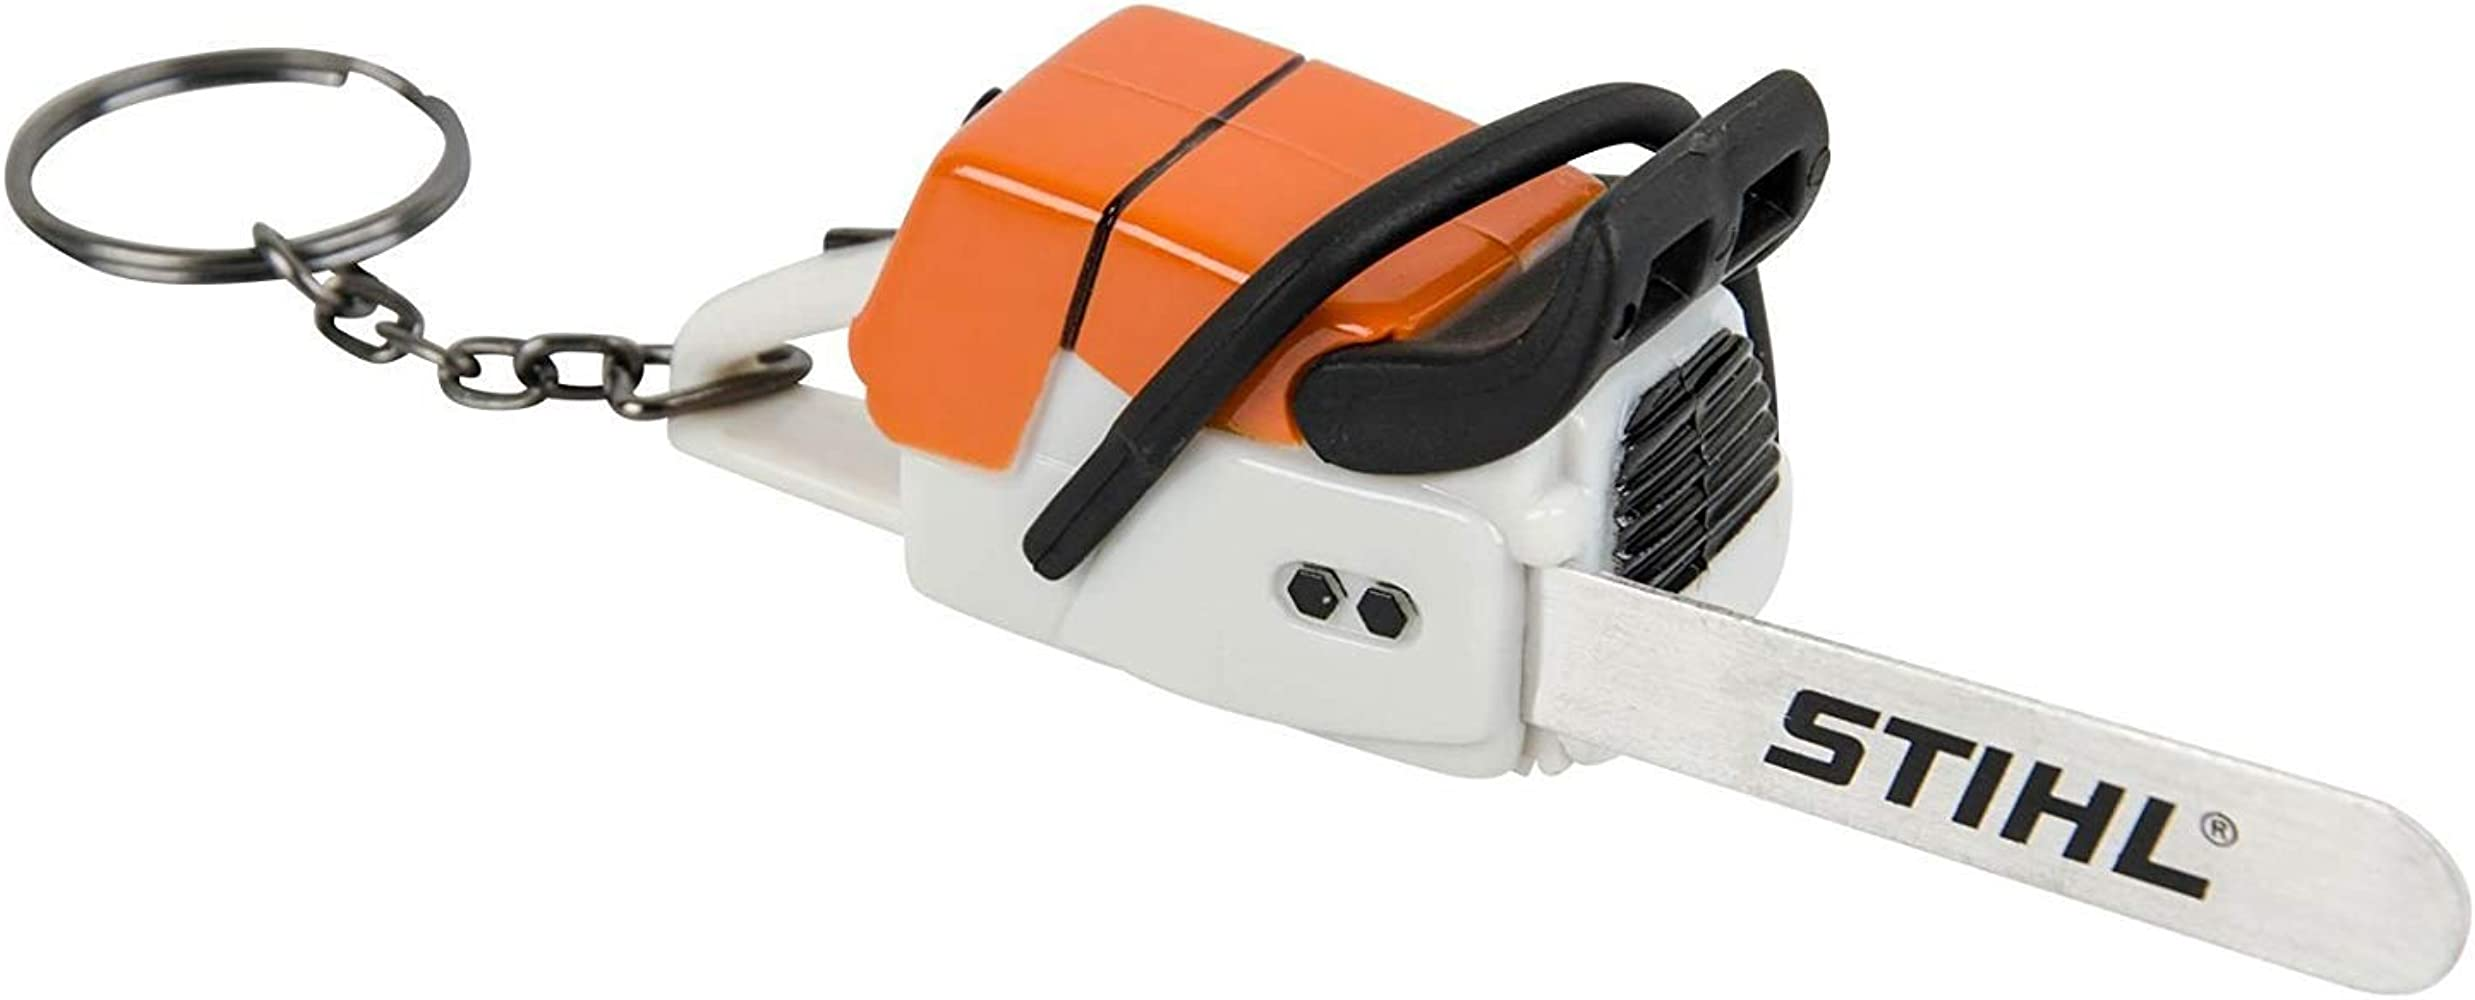 Batterie Stihl Schlüsselanhänger Säge Motorsäge mit Geräusch inkl